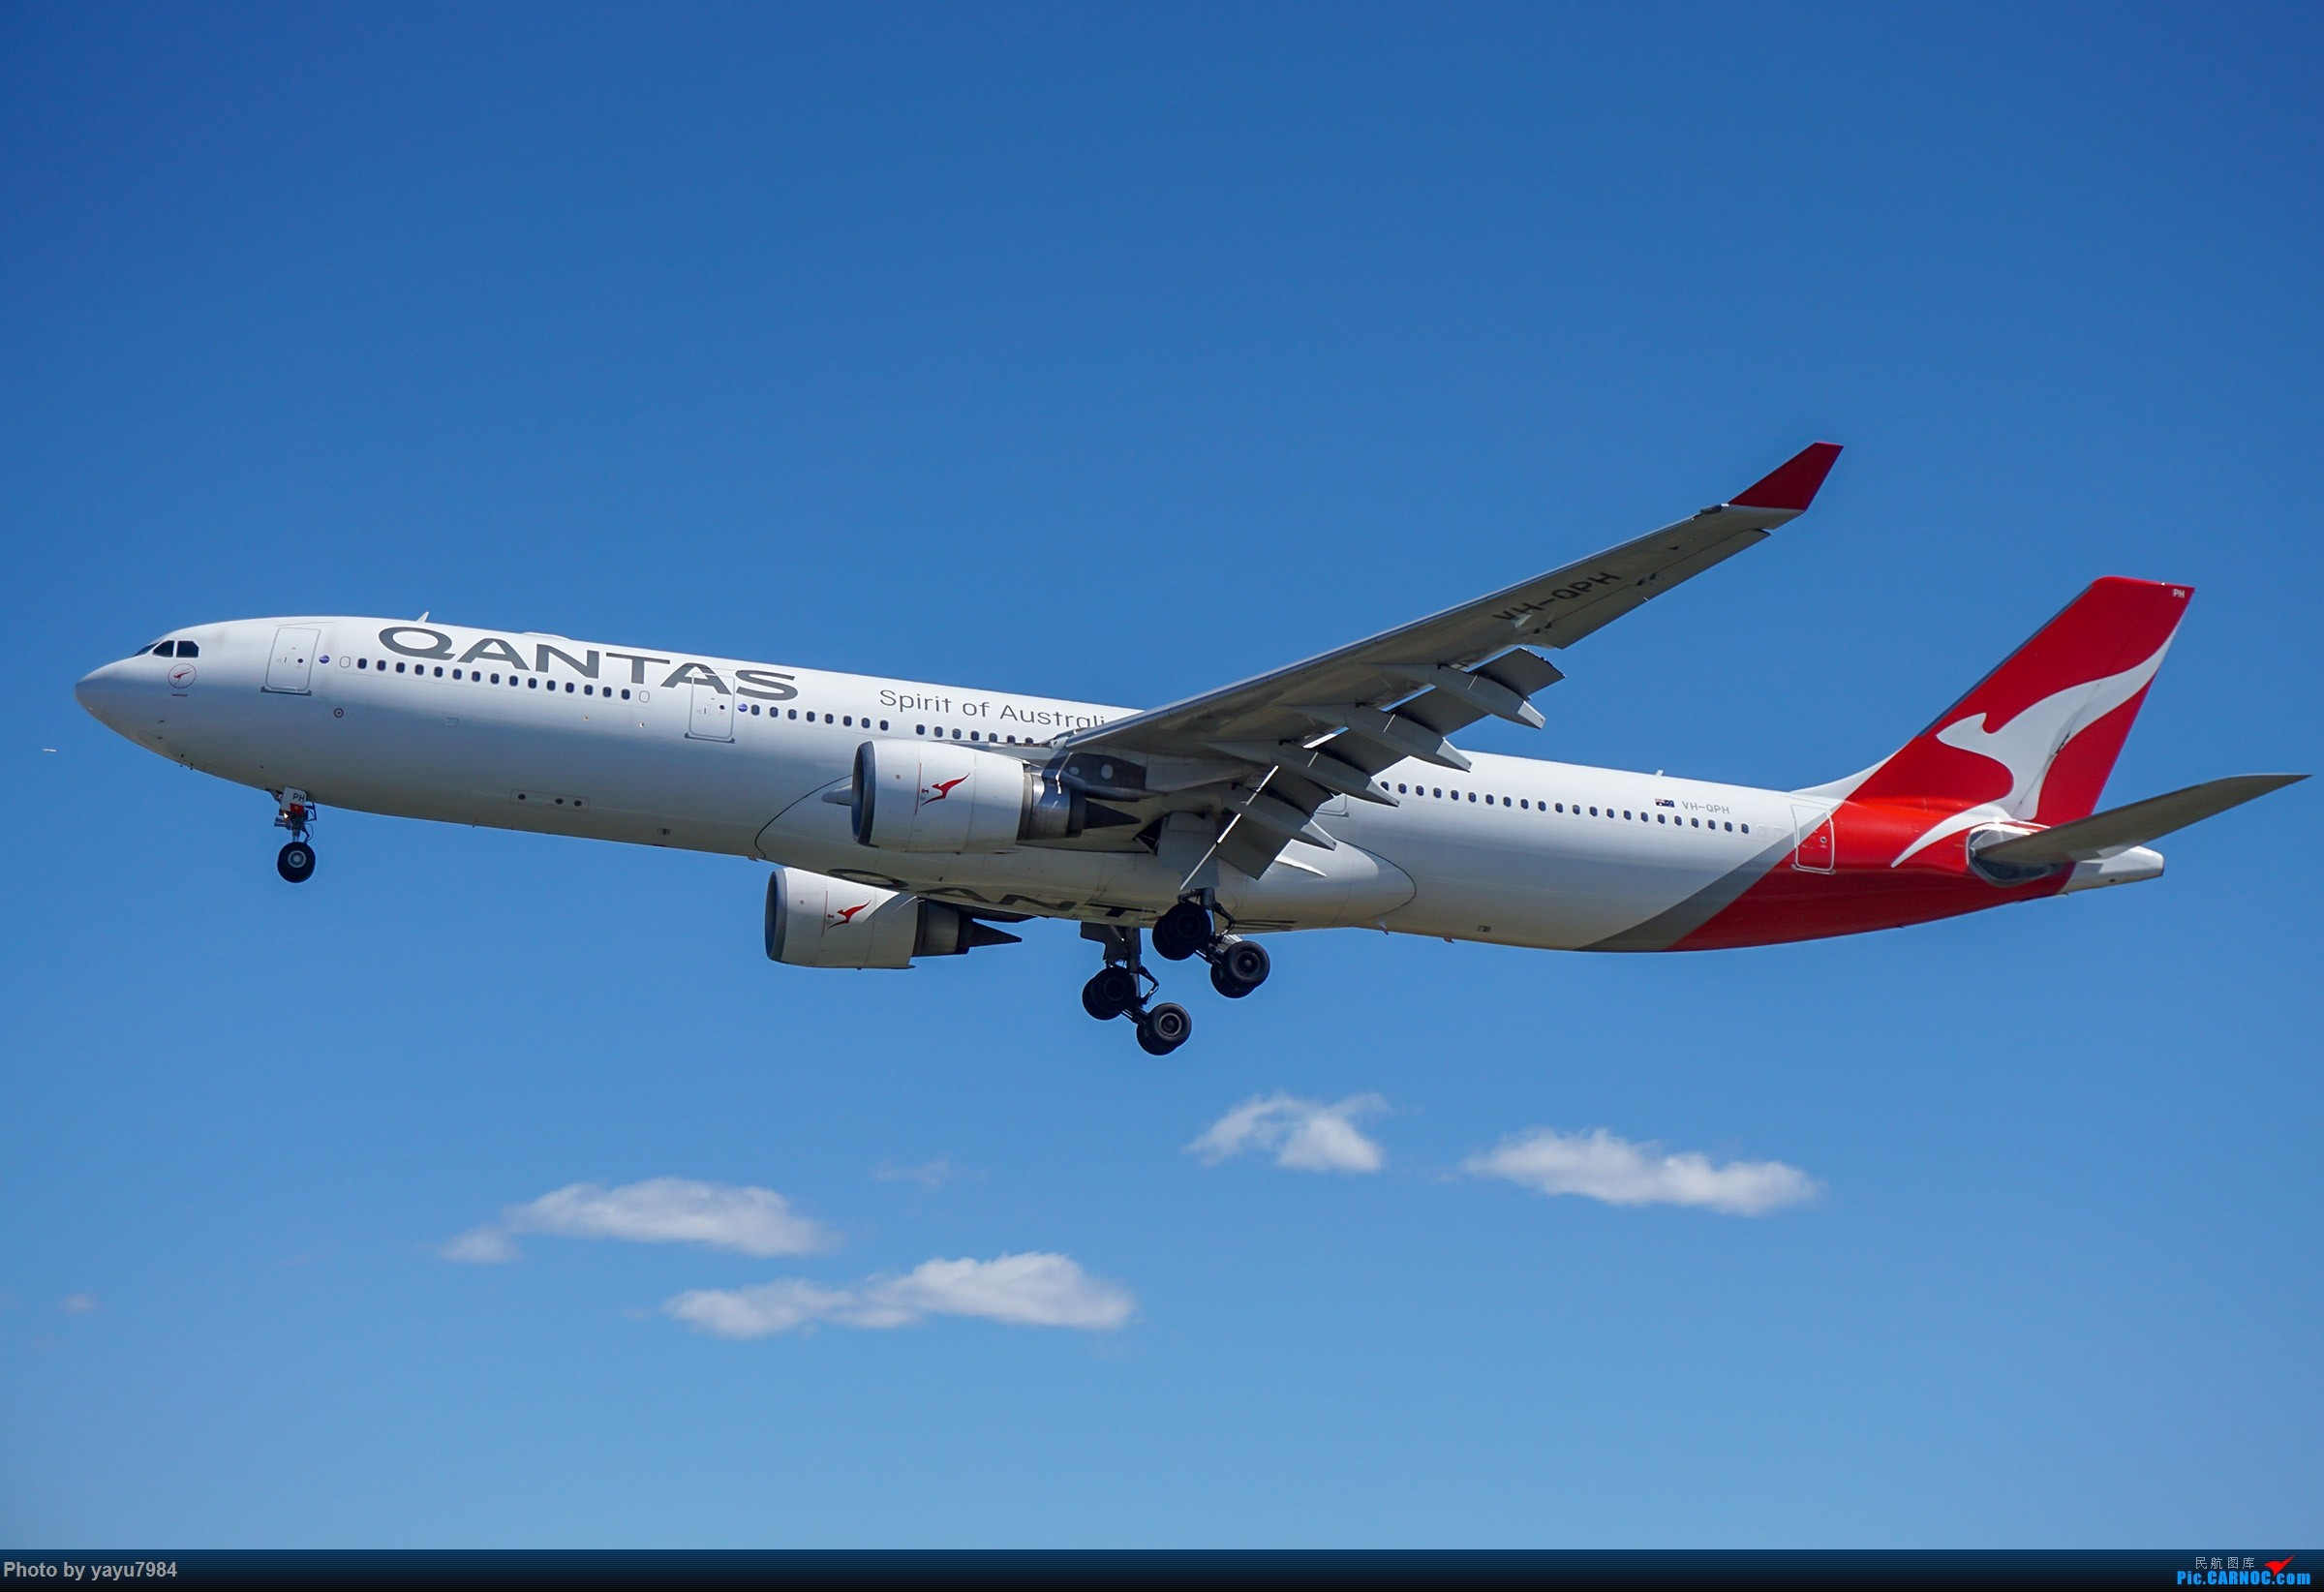 Re:[原创][SYD] 东航天合332,雪绒花343,华航蓝鹊,以及其他日常货 AIRBUS A330-300 VH-QPH 澳大利亚悉尼金斯福德·史密斯机场